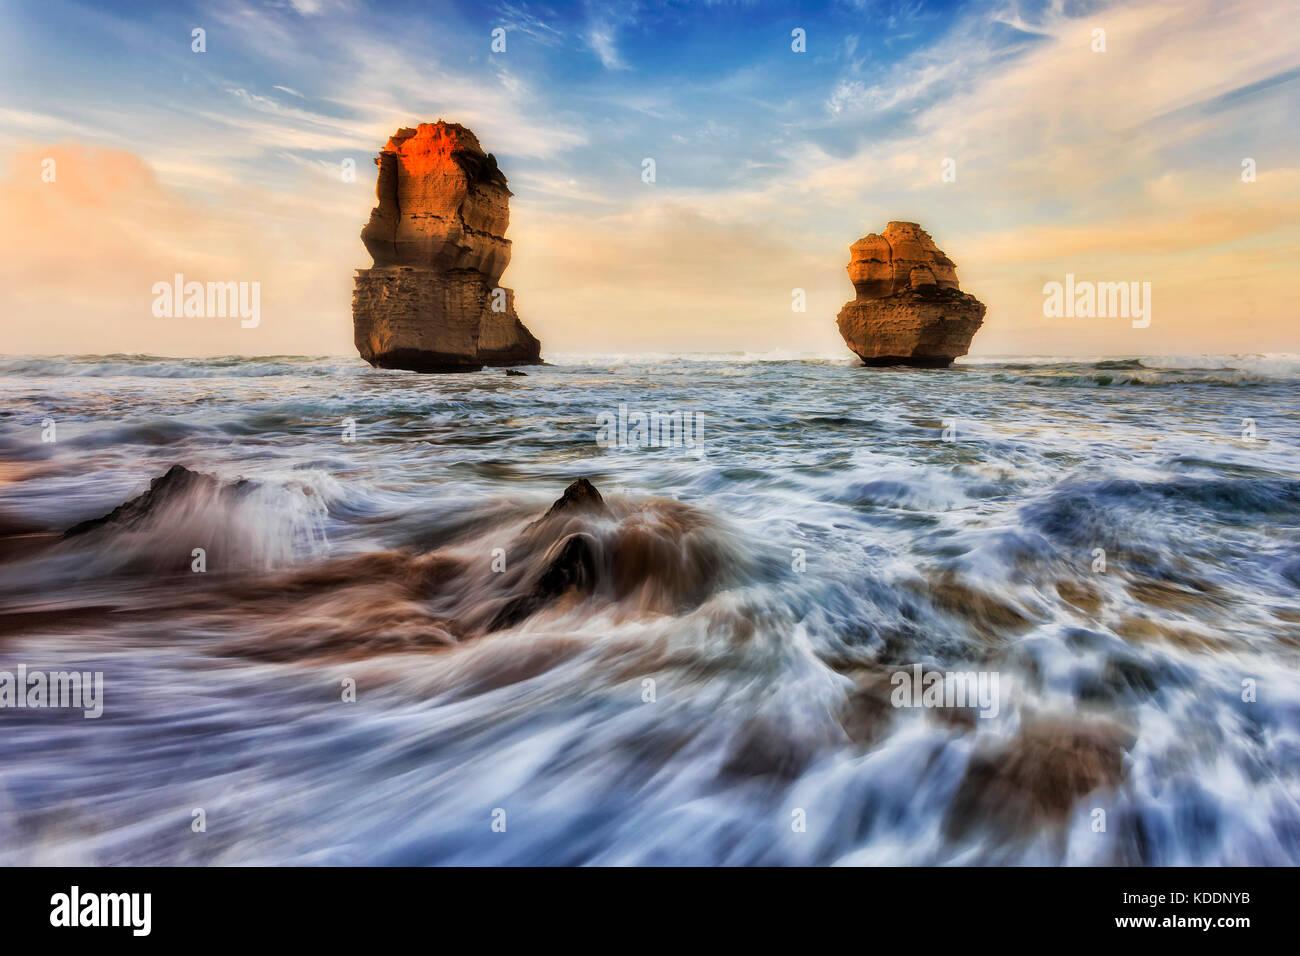 2 limestone apostles off Gibson steps beach at Twelve apostles marine park during sunrise sunlight. - Stock Image